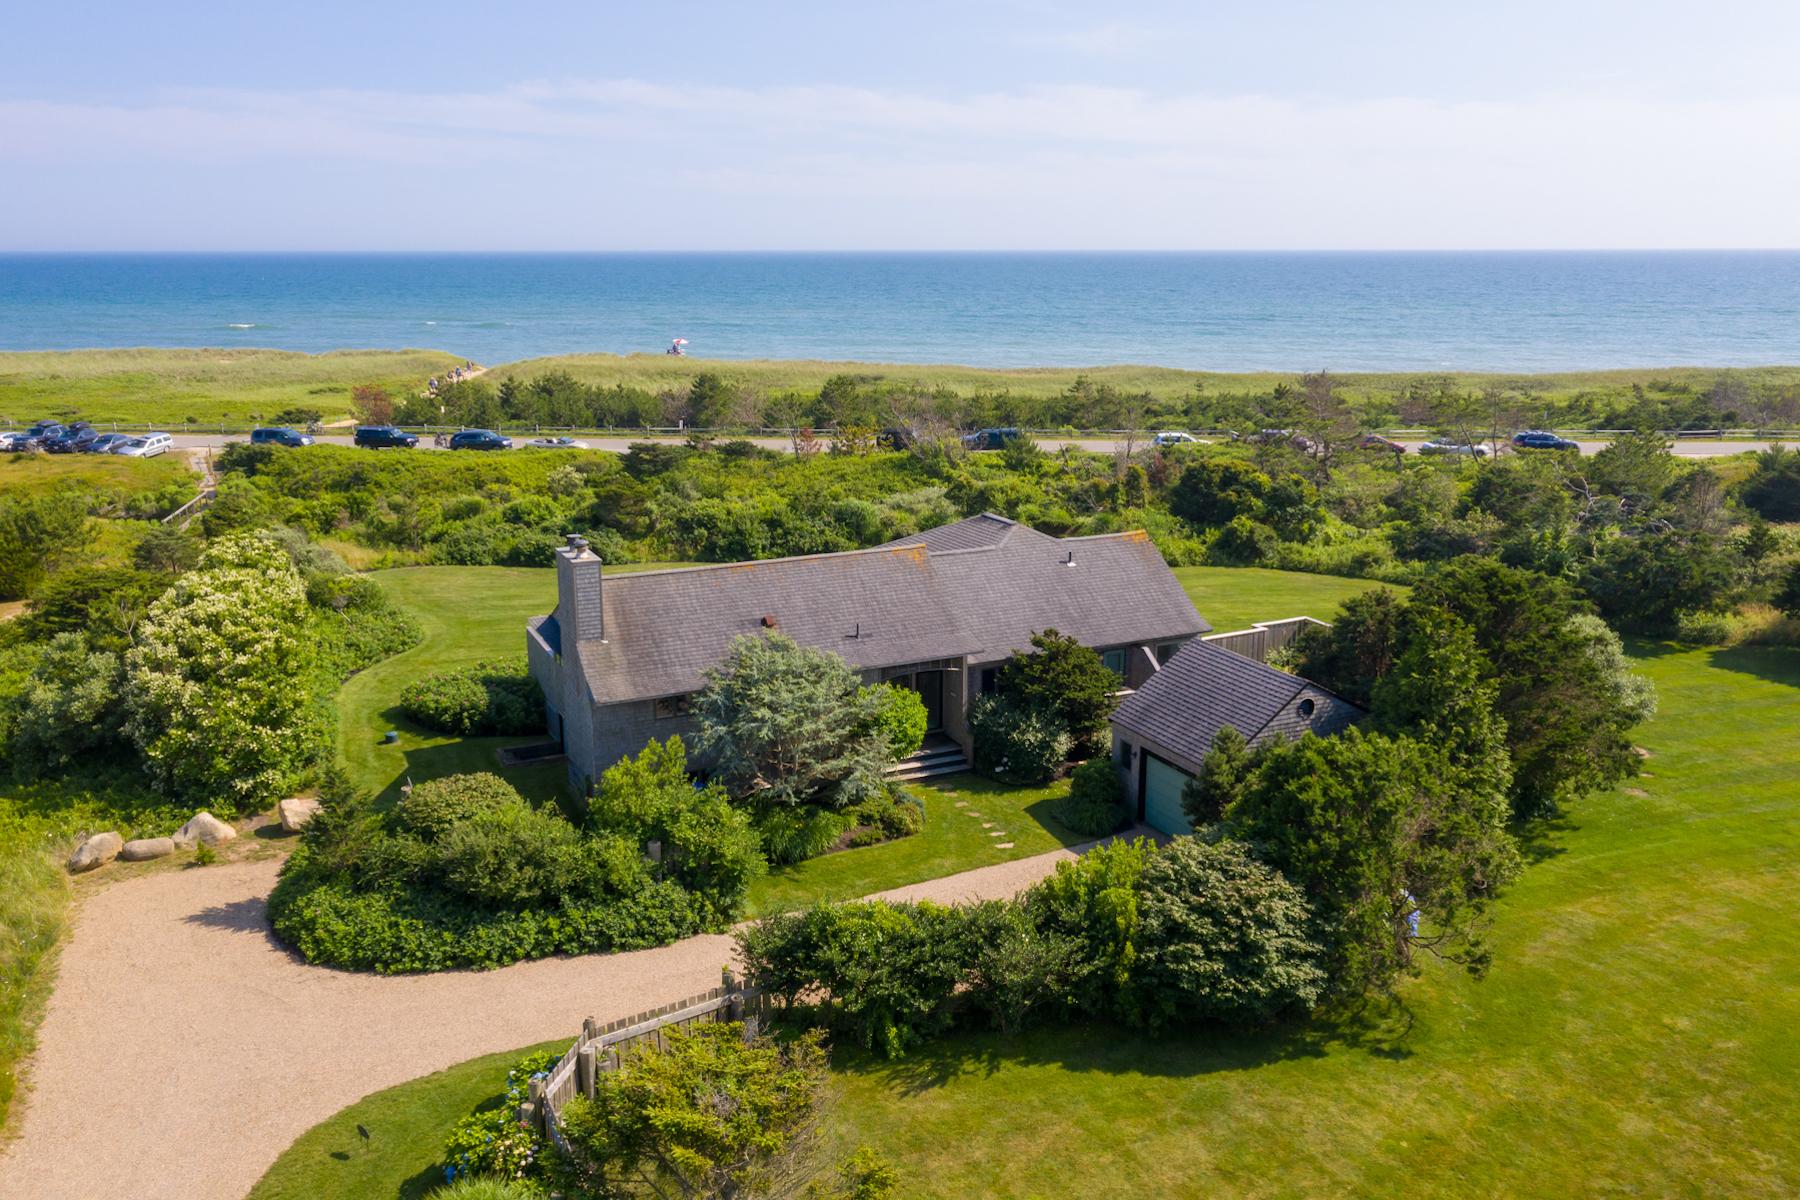 Single Family Homes for Sale at Beach House in Katama 106 Mattakesett Way Edgartown, Massachusetts 02539 United States